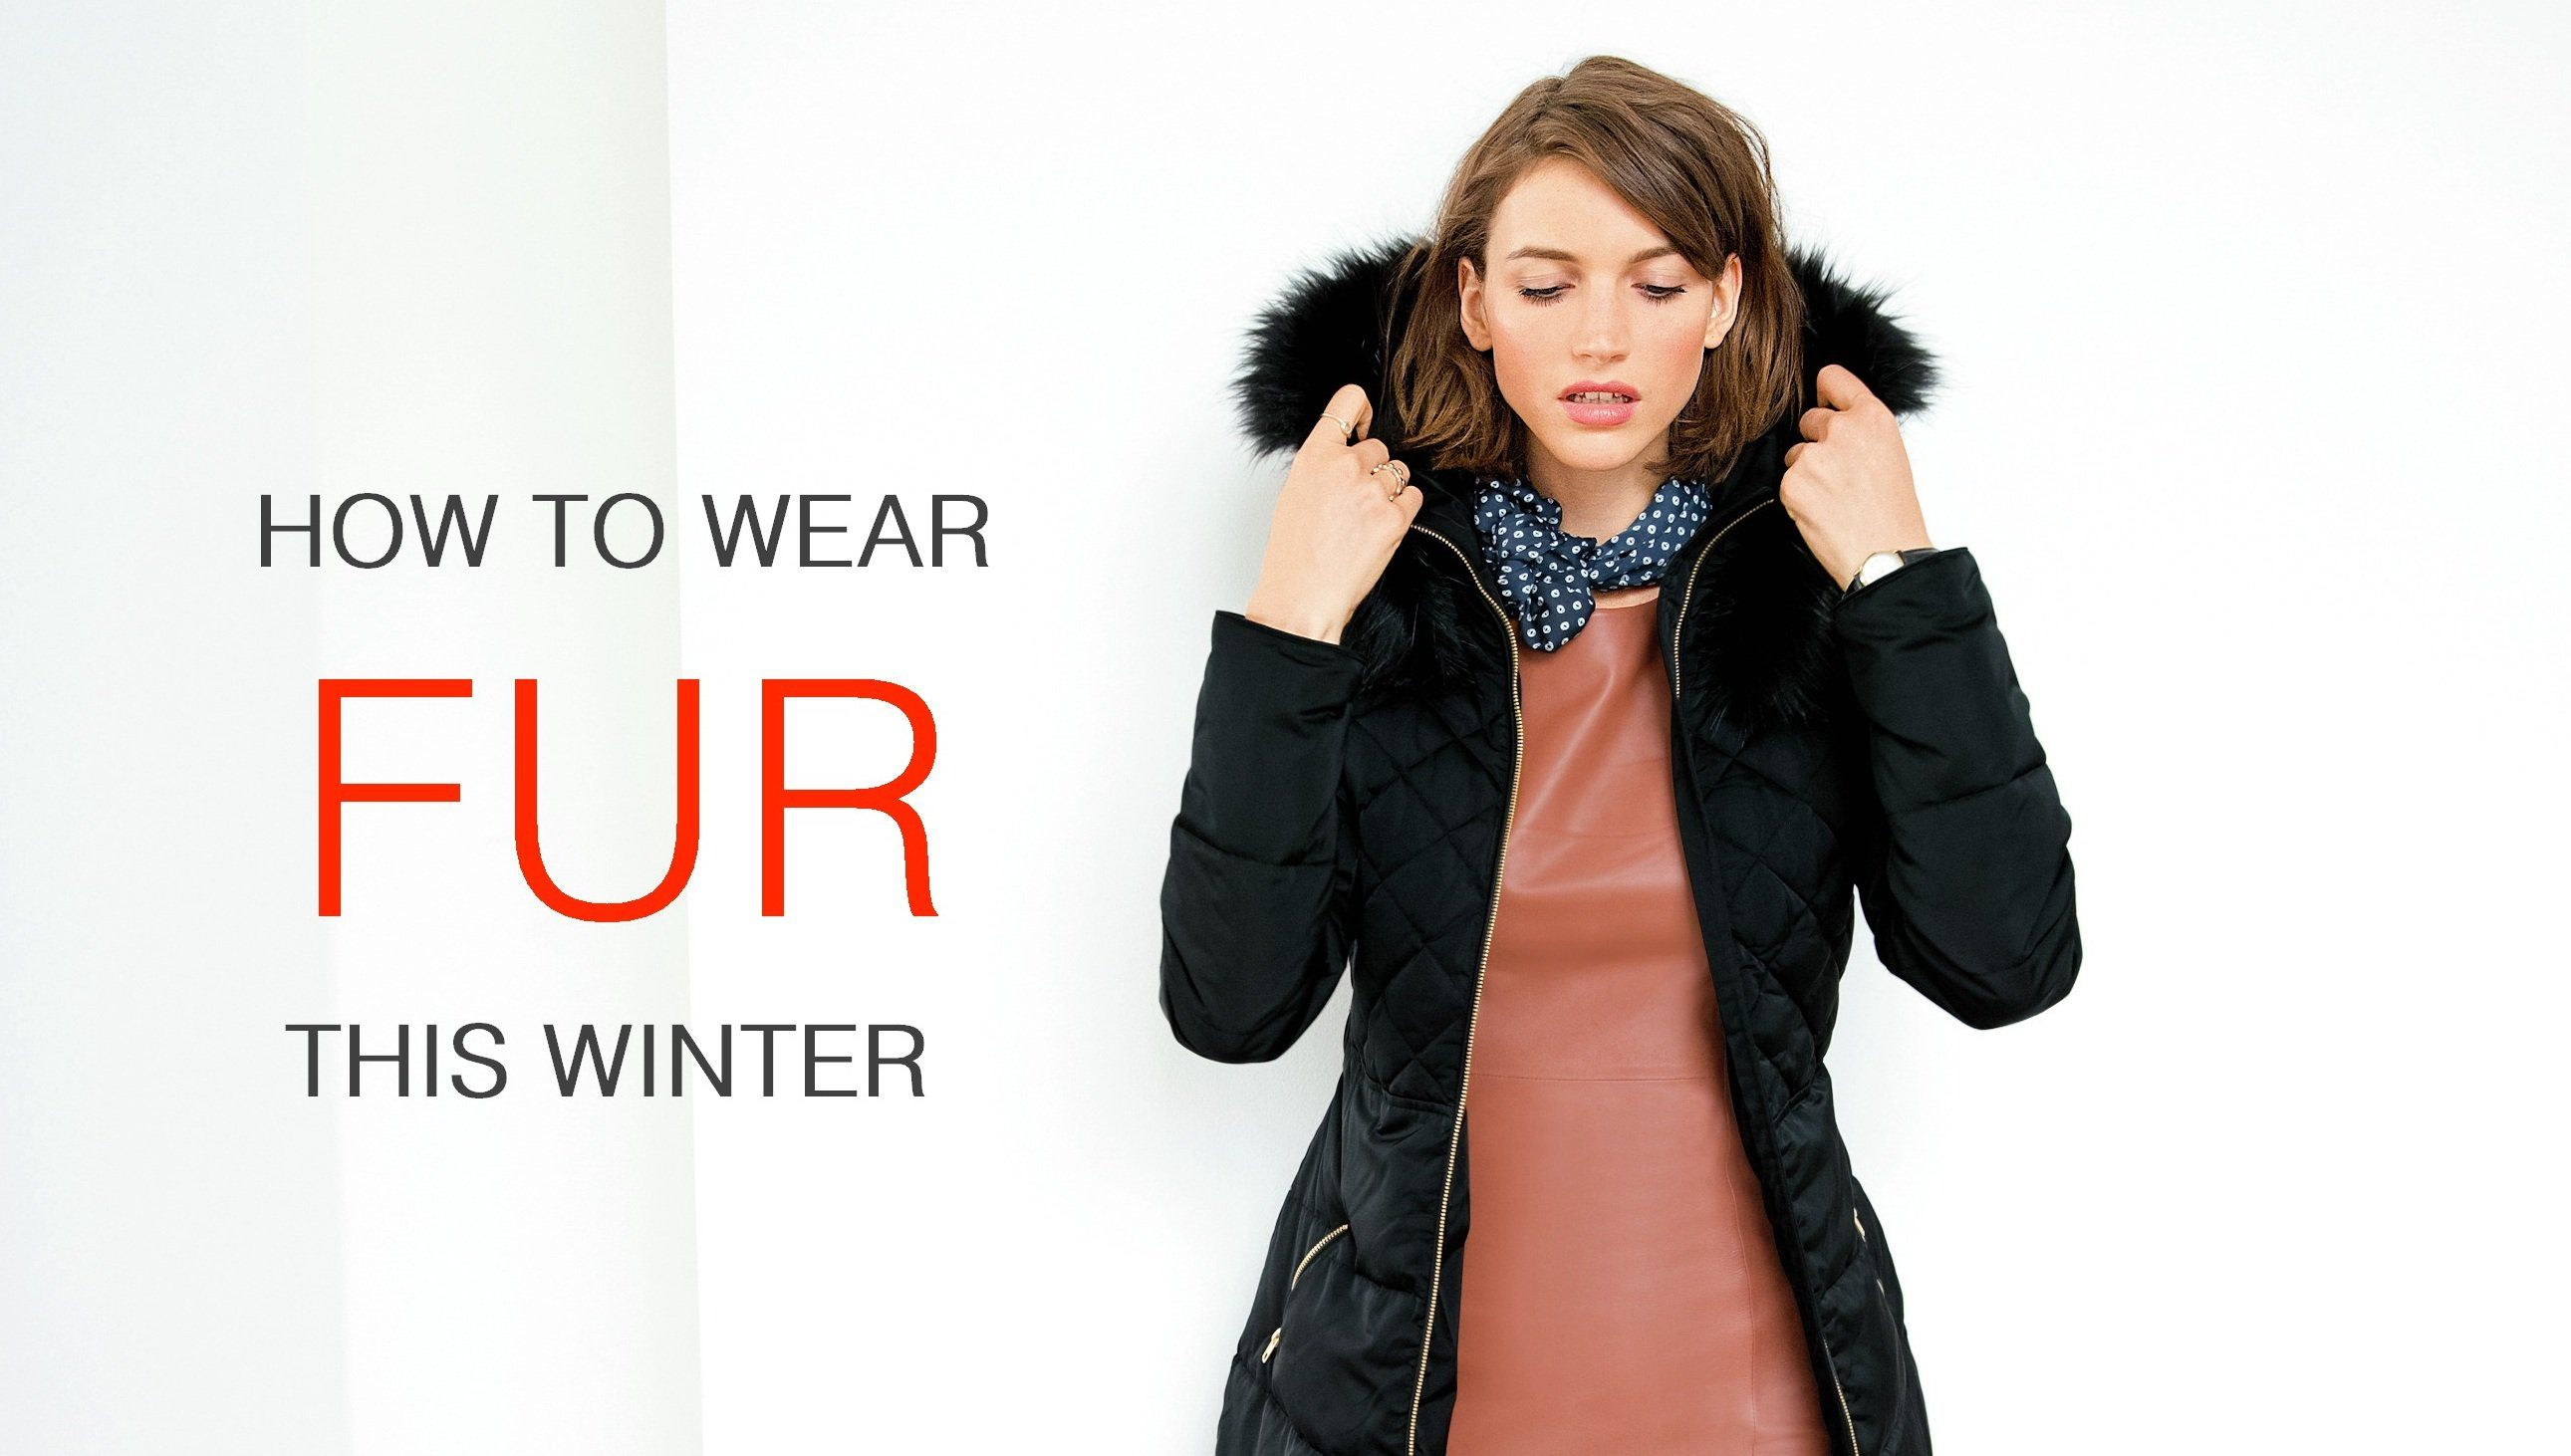 fur_featured_laredoute_fashion_style